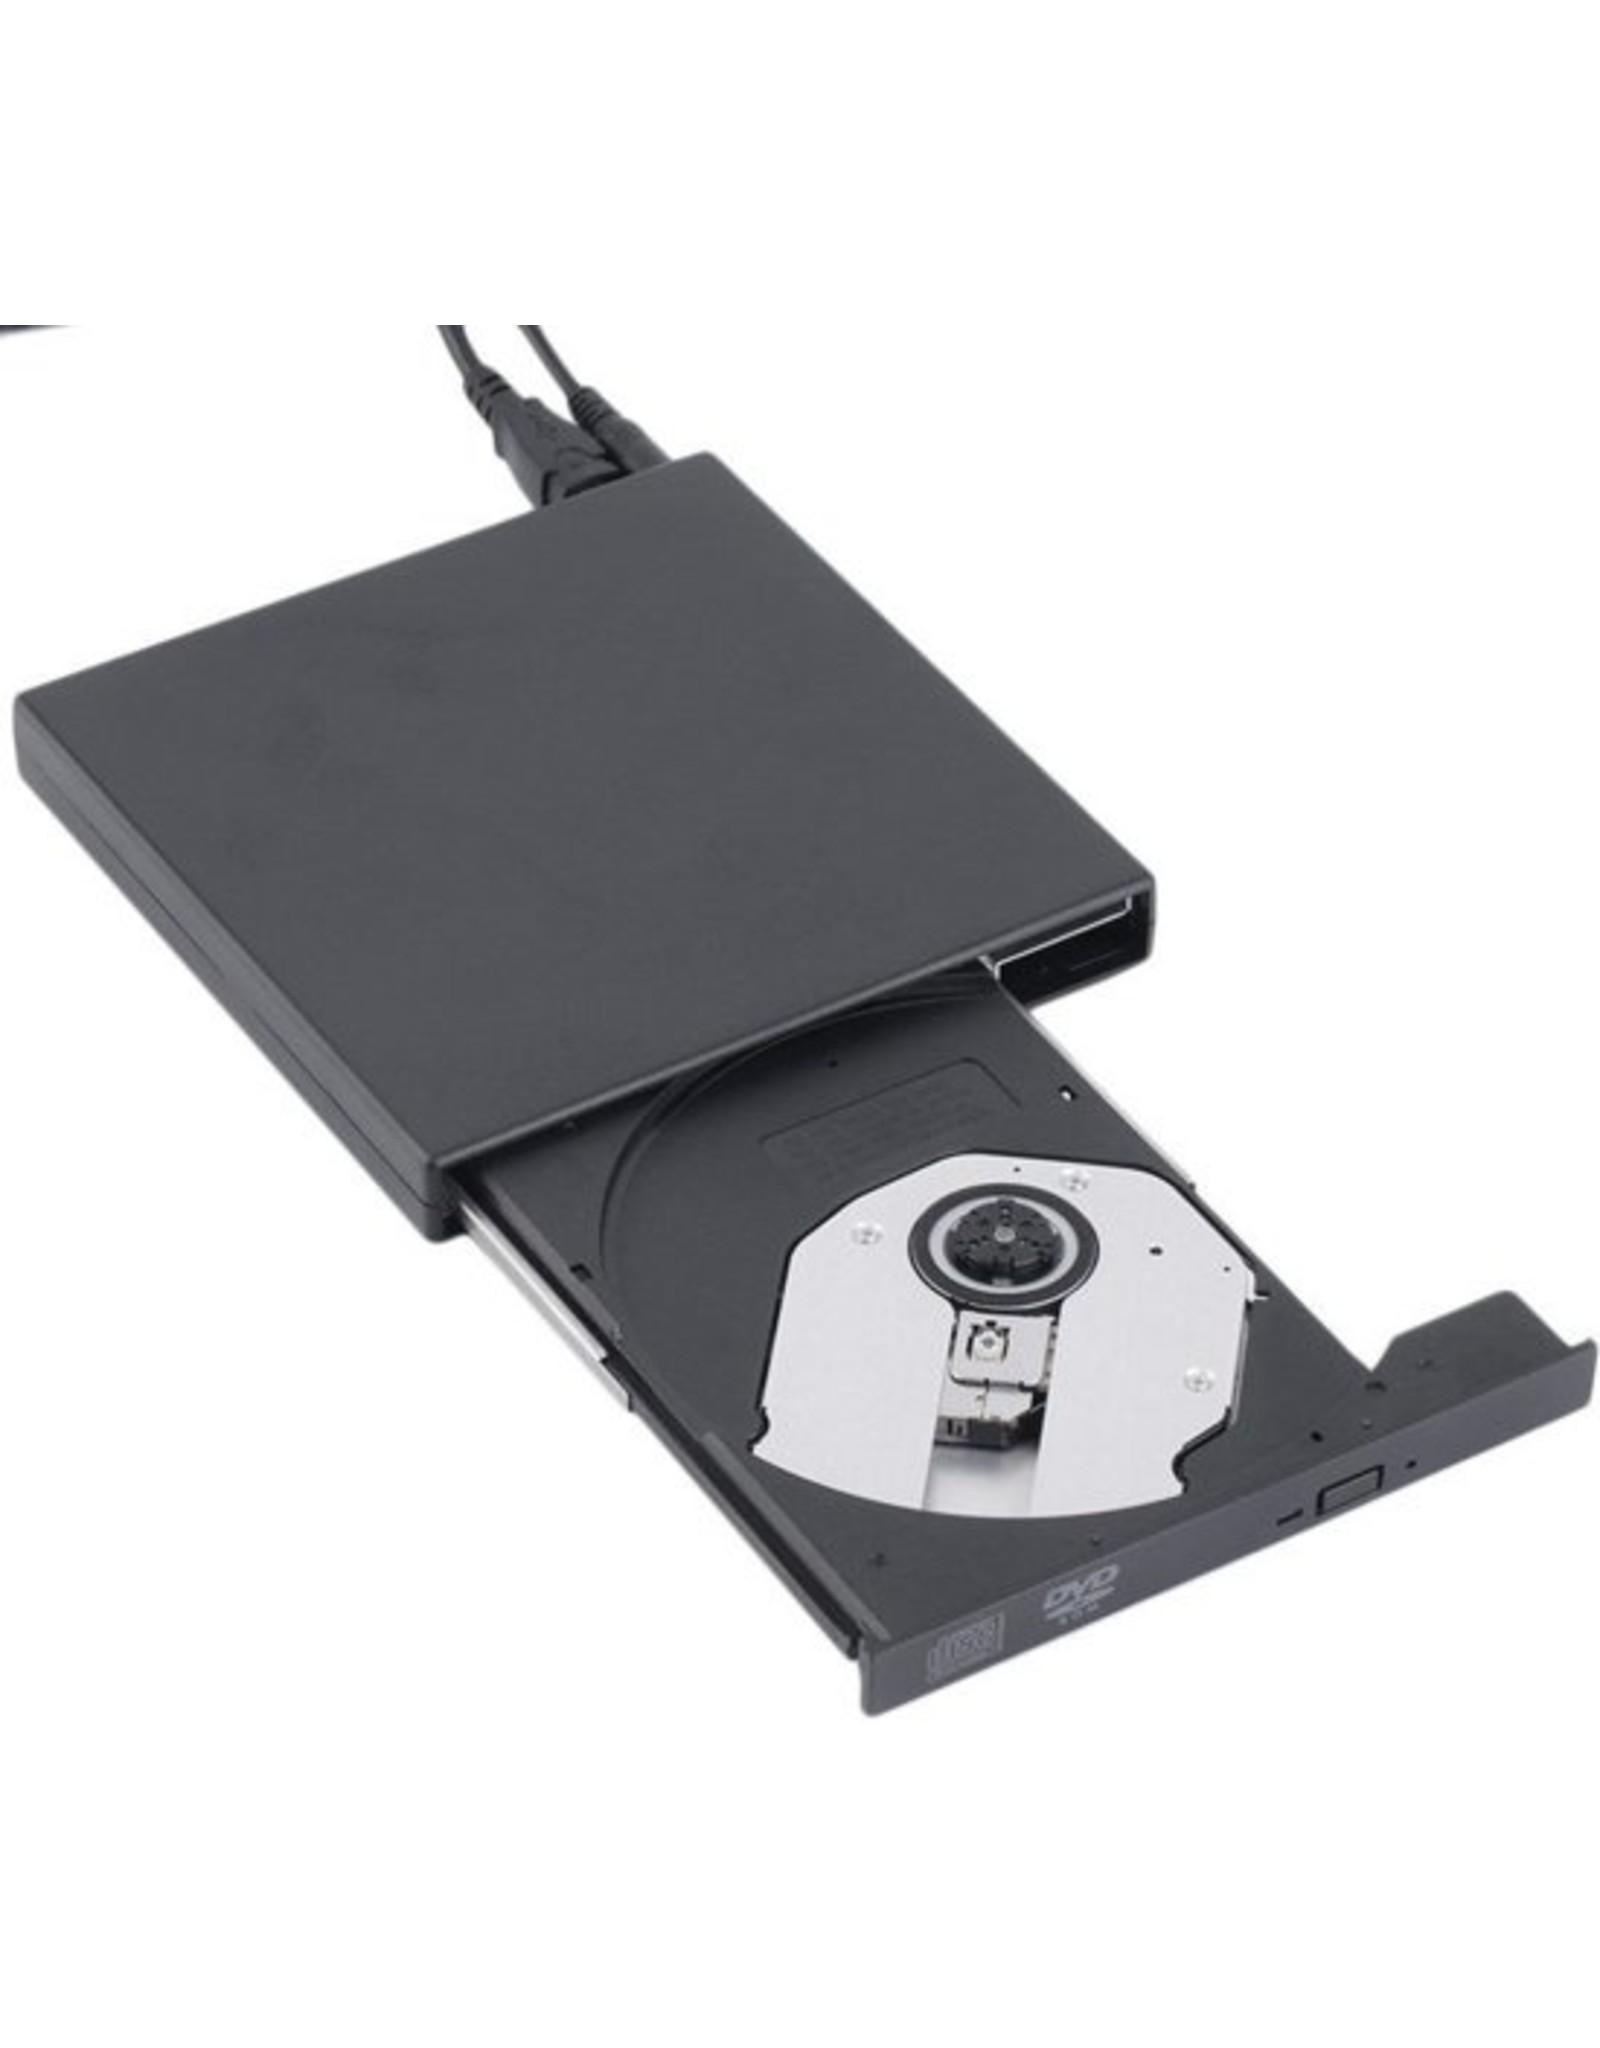 Parya Official Plug & Play Externe CD/DVD Combo Drive Speler Reader - EV